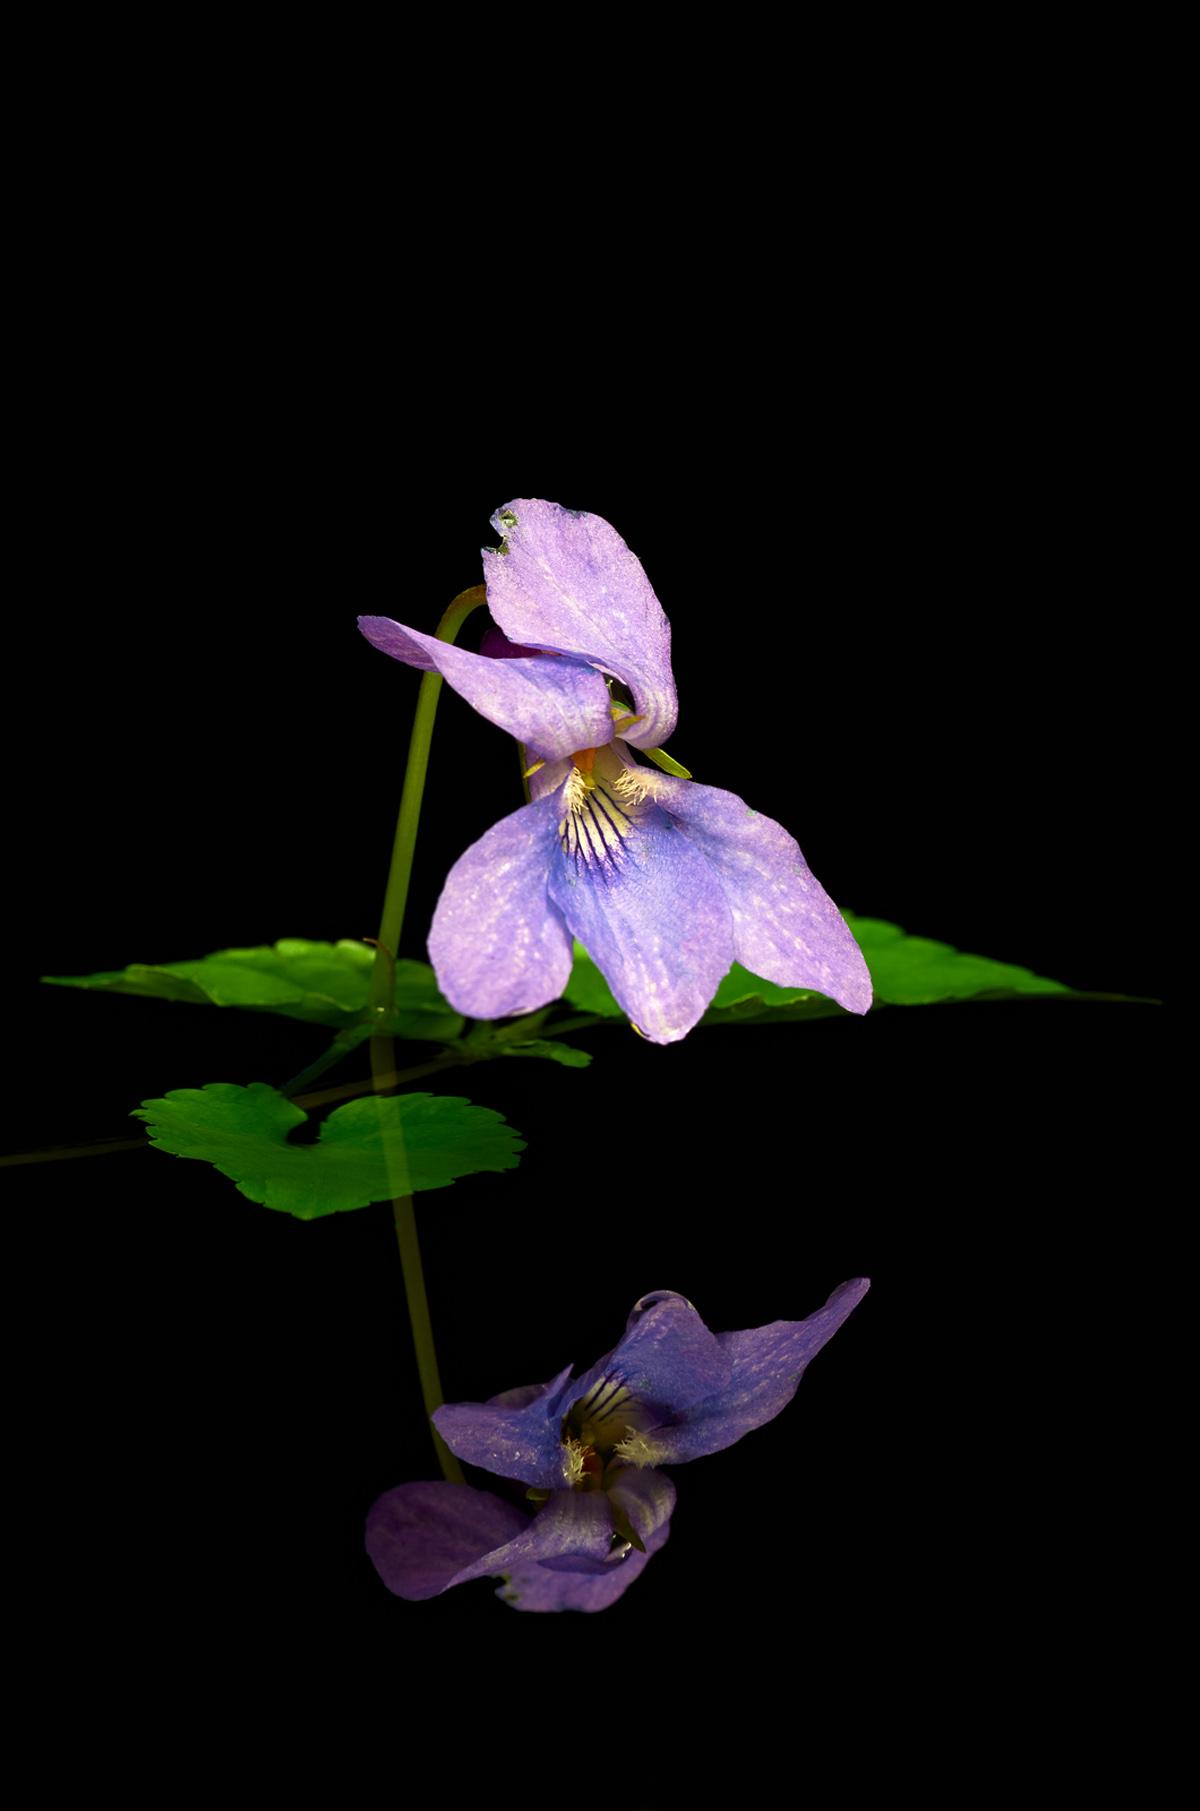 201504  blue violet reflection 8115 rz rz sh sRGB.jpg